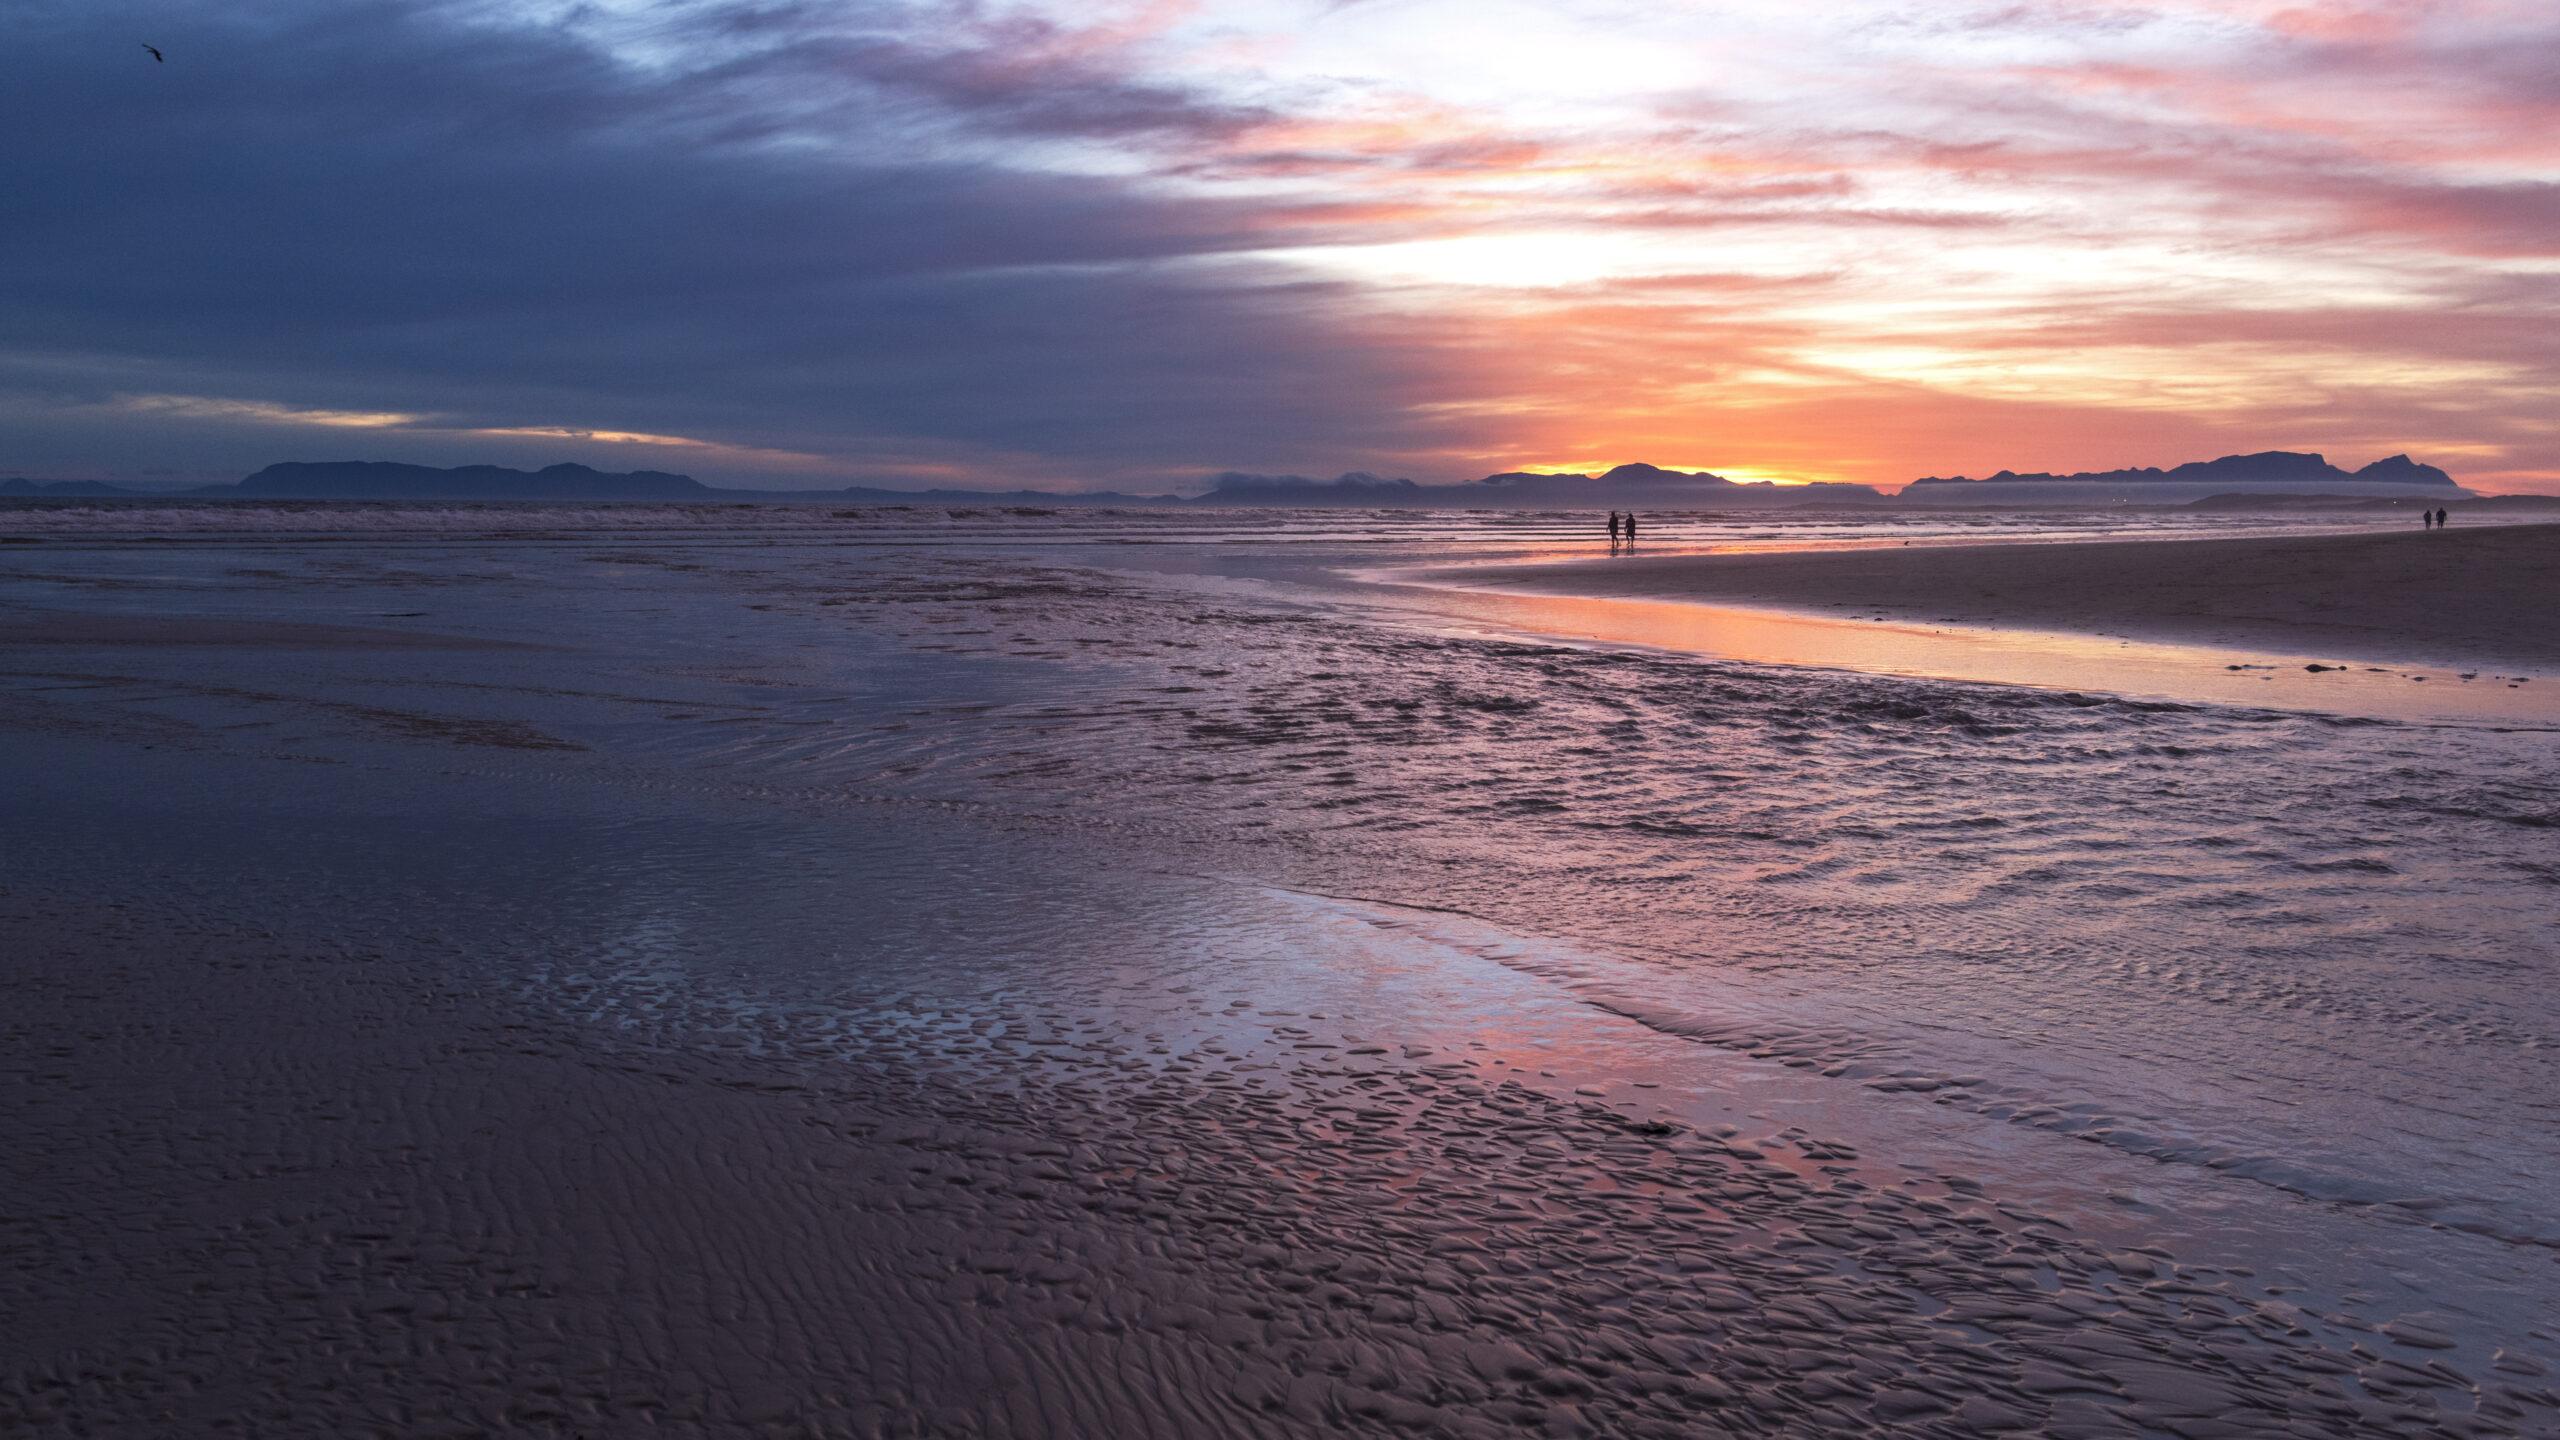 landscape photography, ocean, sea, sunset, incandescence, future, present actions, purpose, journey, beautiful world,